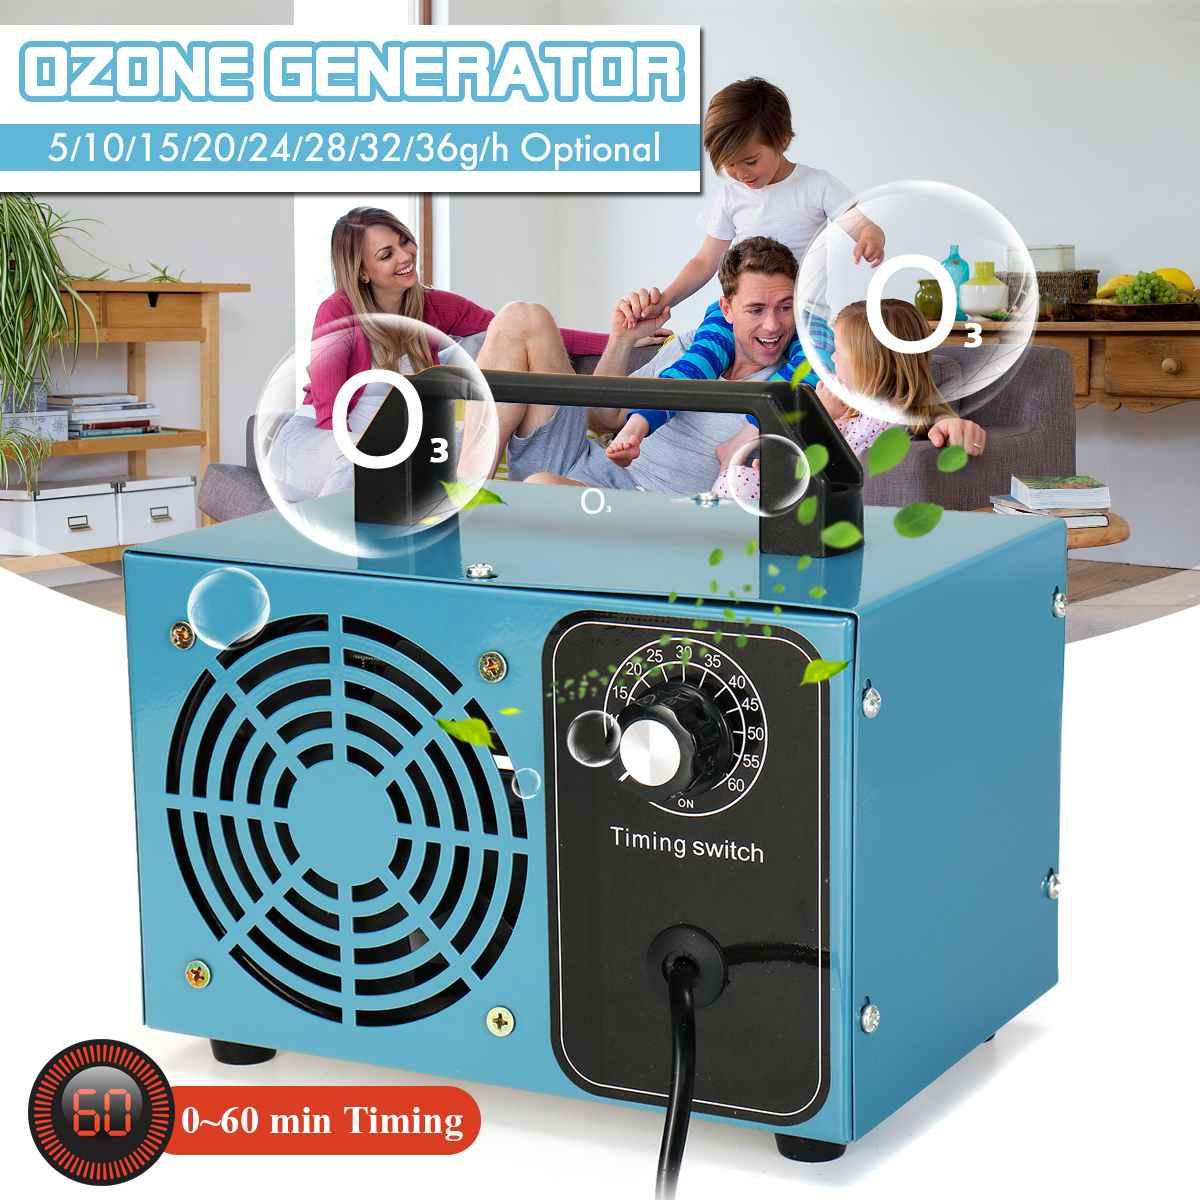 220V ozone generator 36g 28g ozone machine Air Purifier Sterilizer treatment Ozone addition to formaldehyde machine with timer